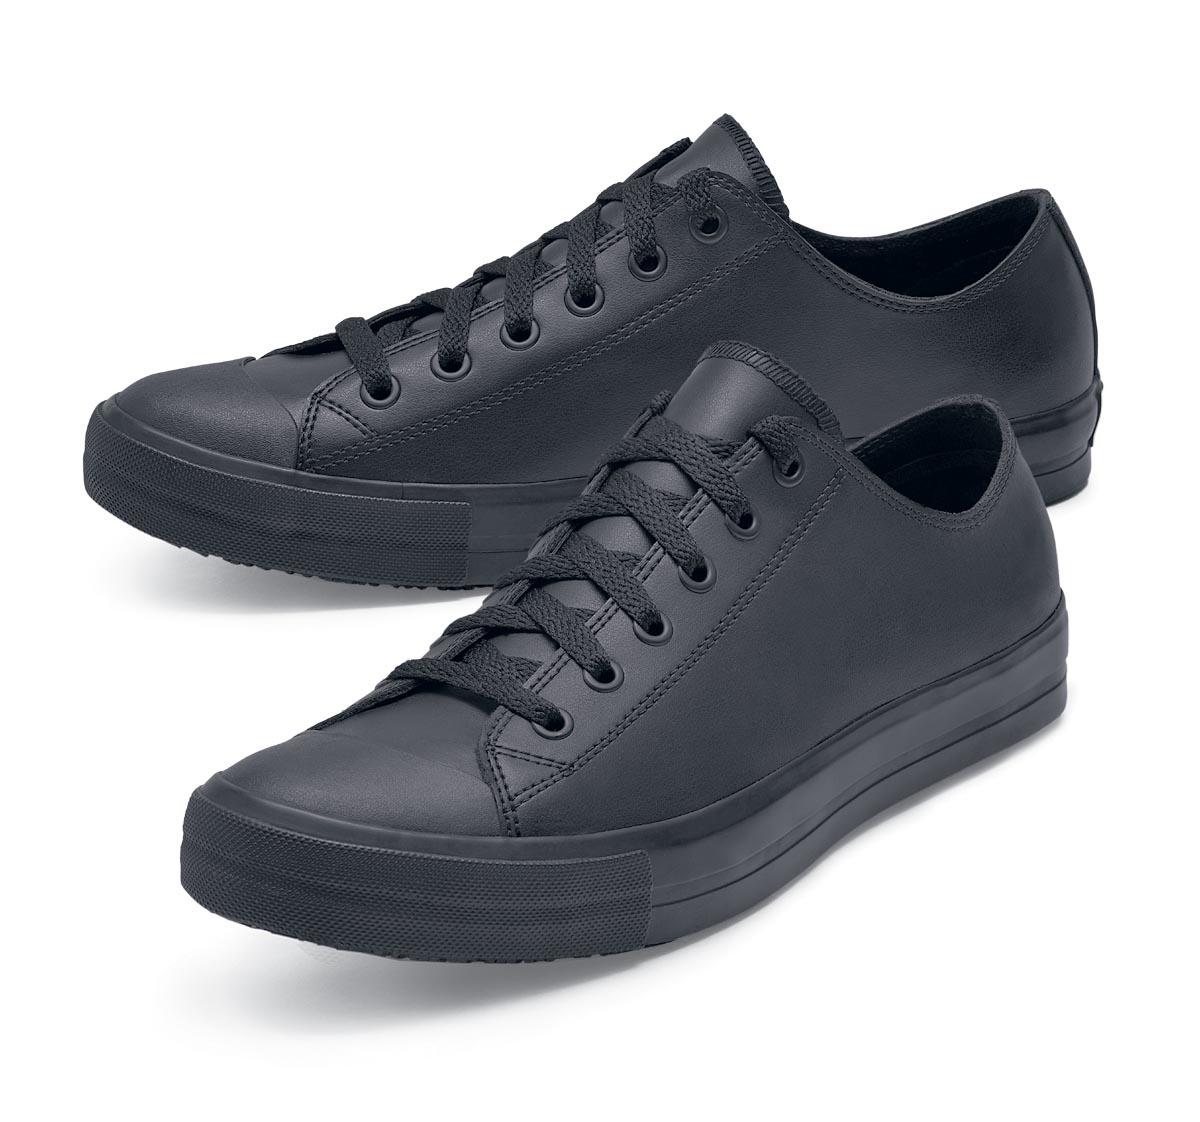 buy online 3a573 79228 Shoes for Crews SFC Arbeitsschuhe DELRAY, Leder, 32394 Damen